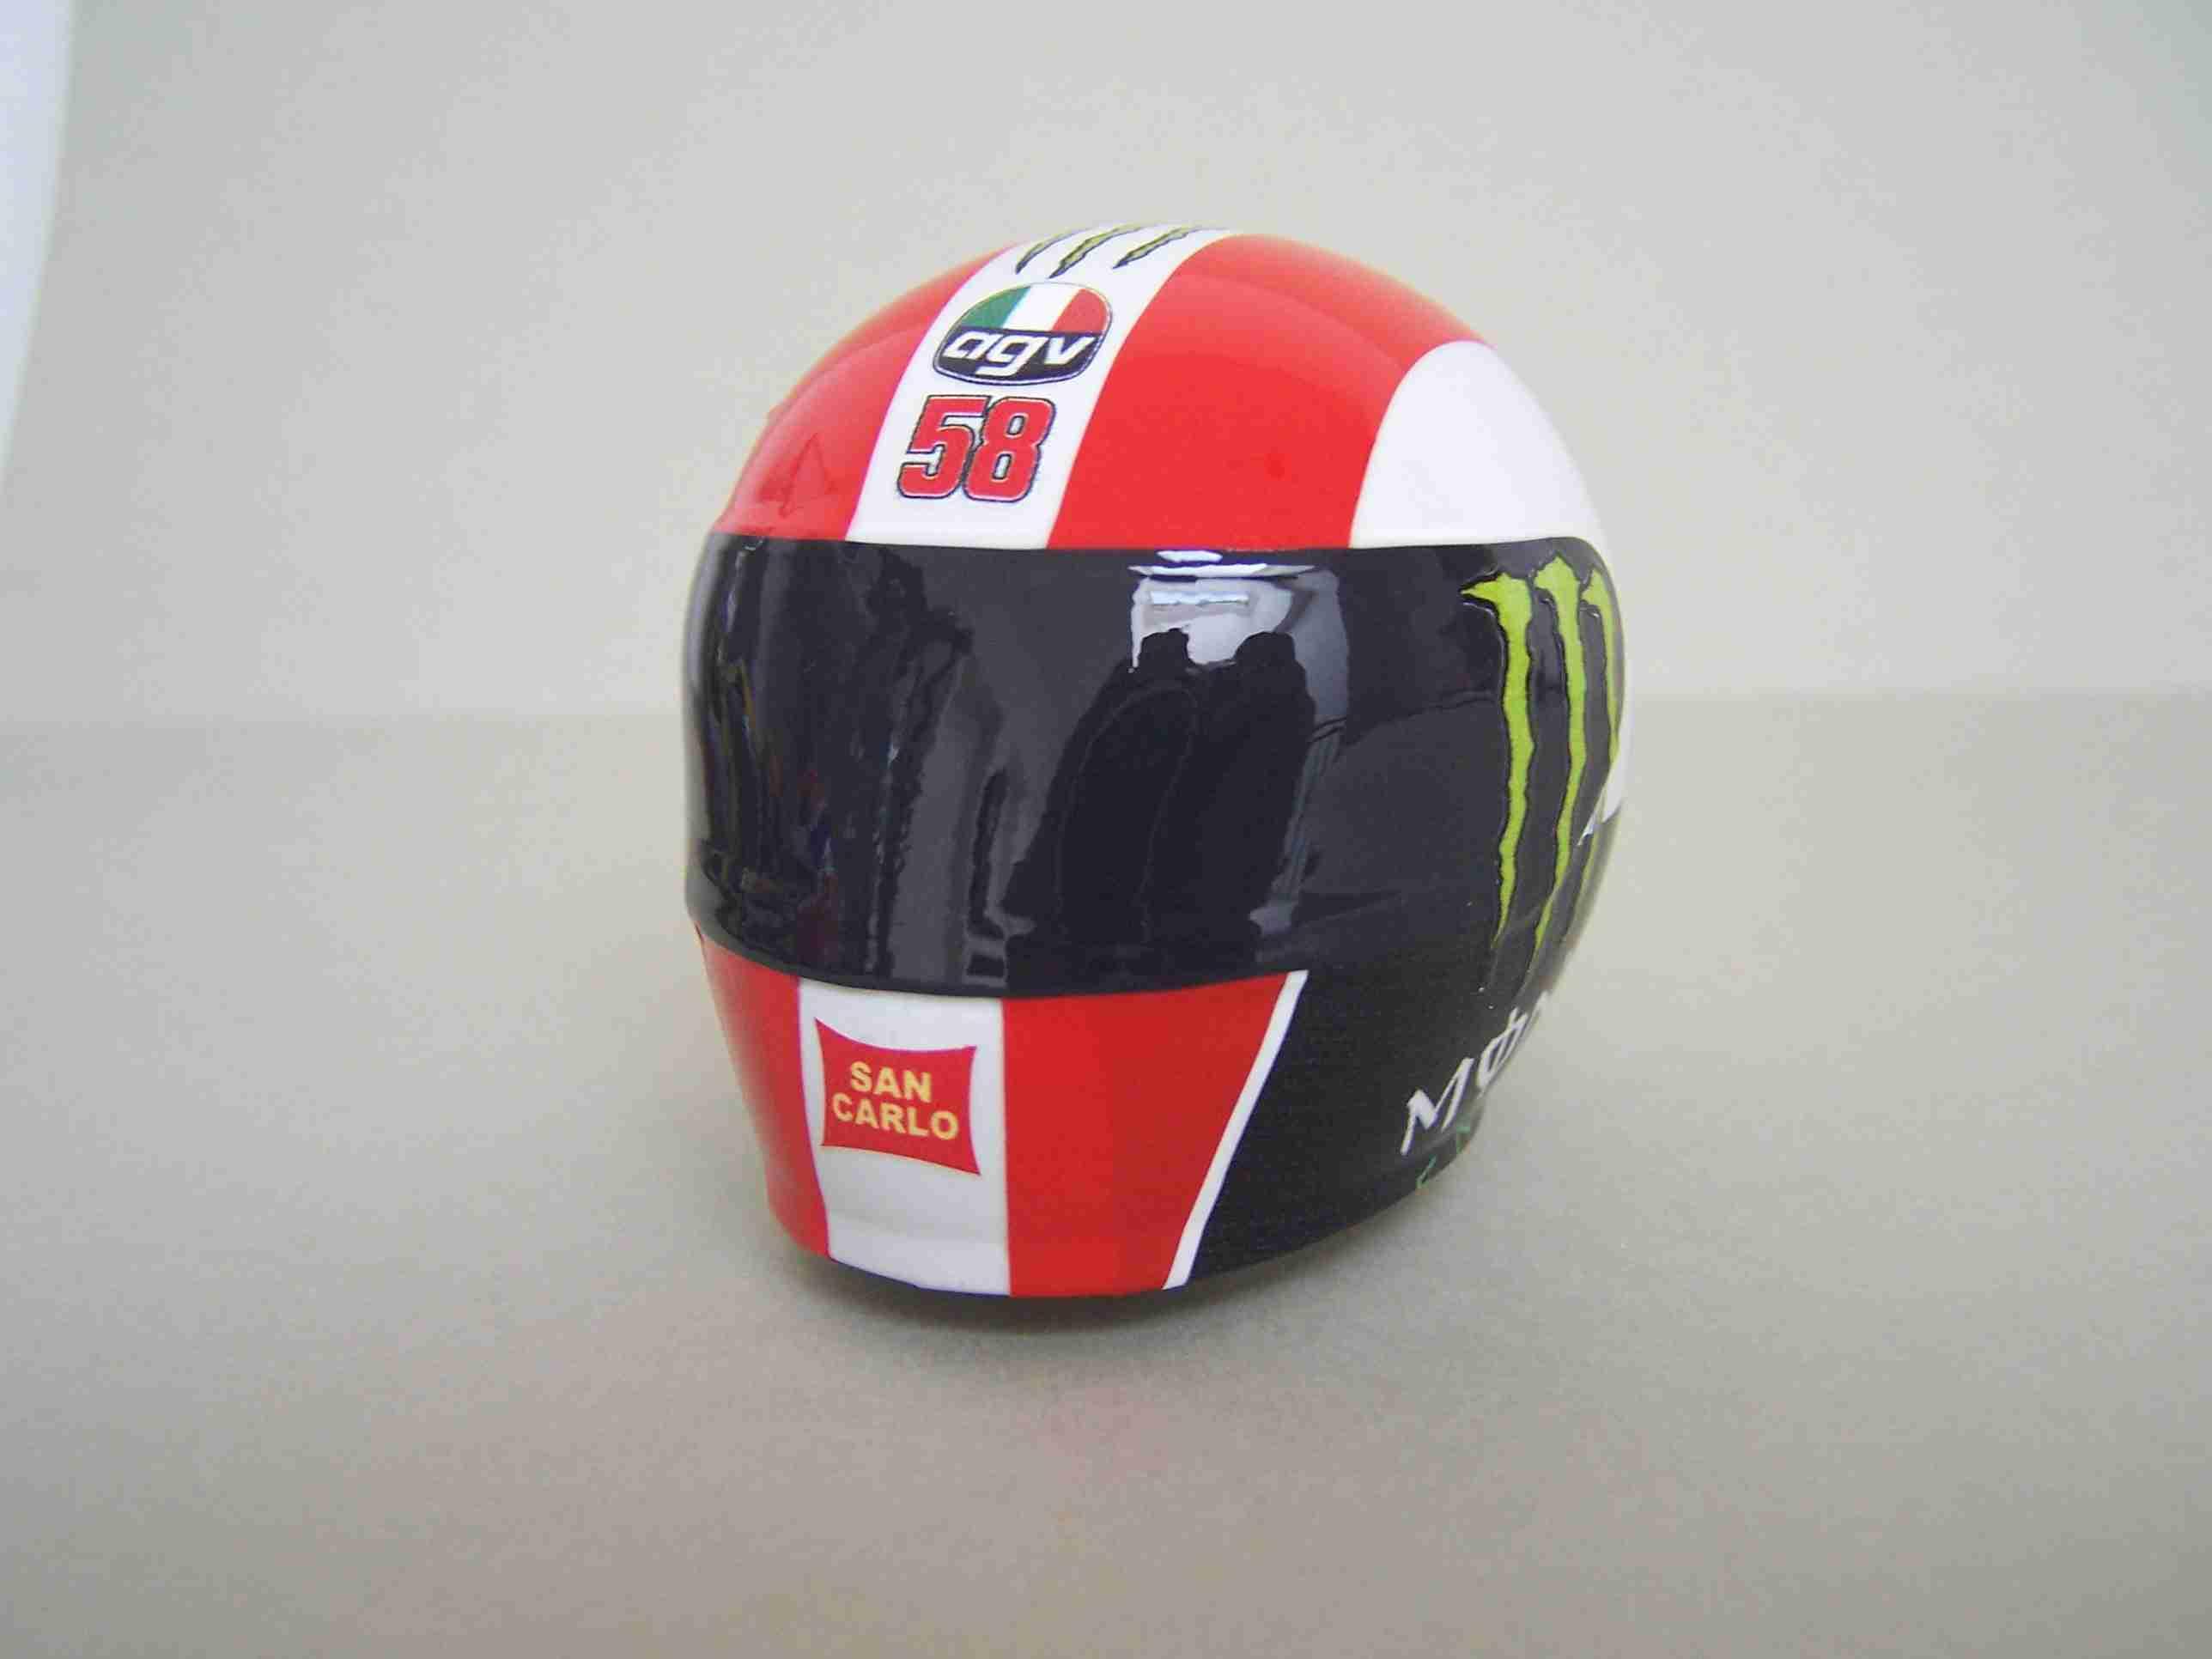 [Helm-Facory-Bike-Body-Gresini-Honda-Driver-Simoncelli-SB-5.jpg2_.jpg]